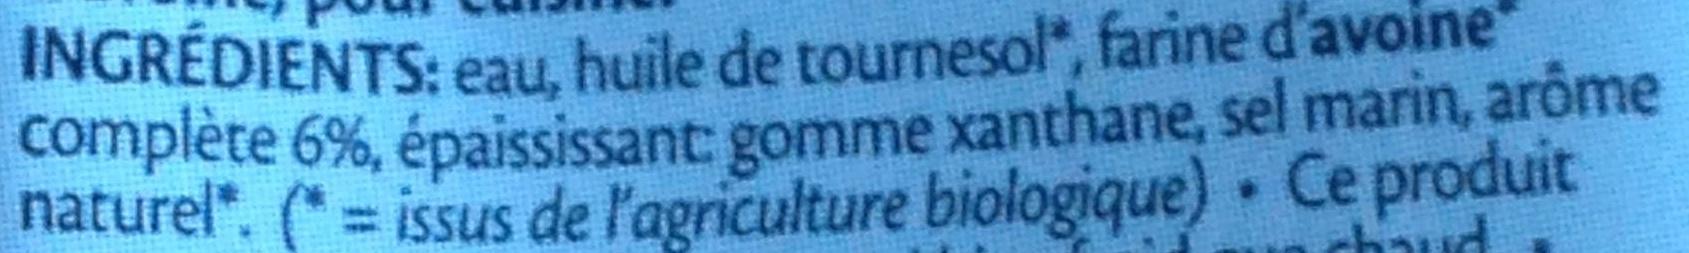 Cuisine Avoine - Ingredients - fr